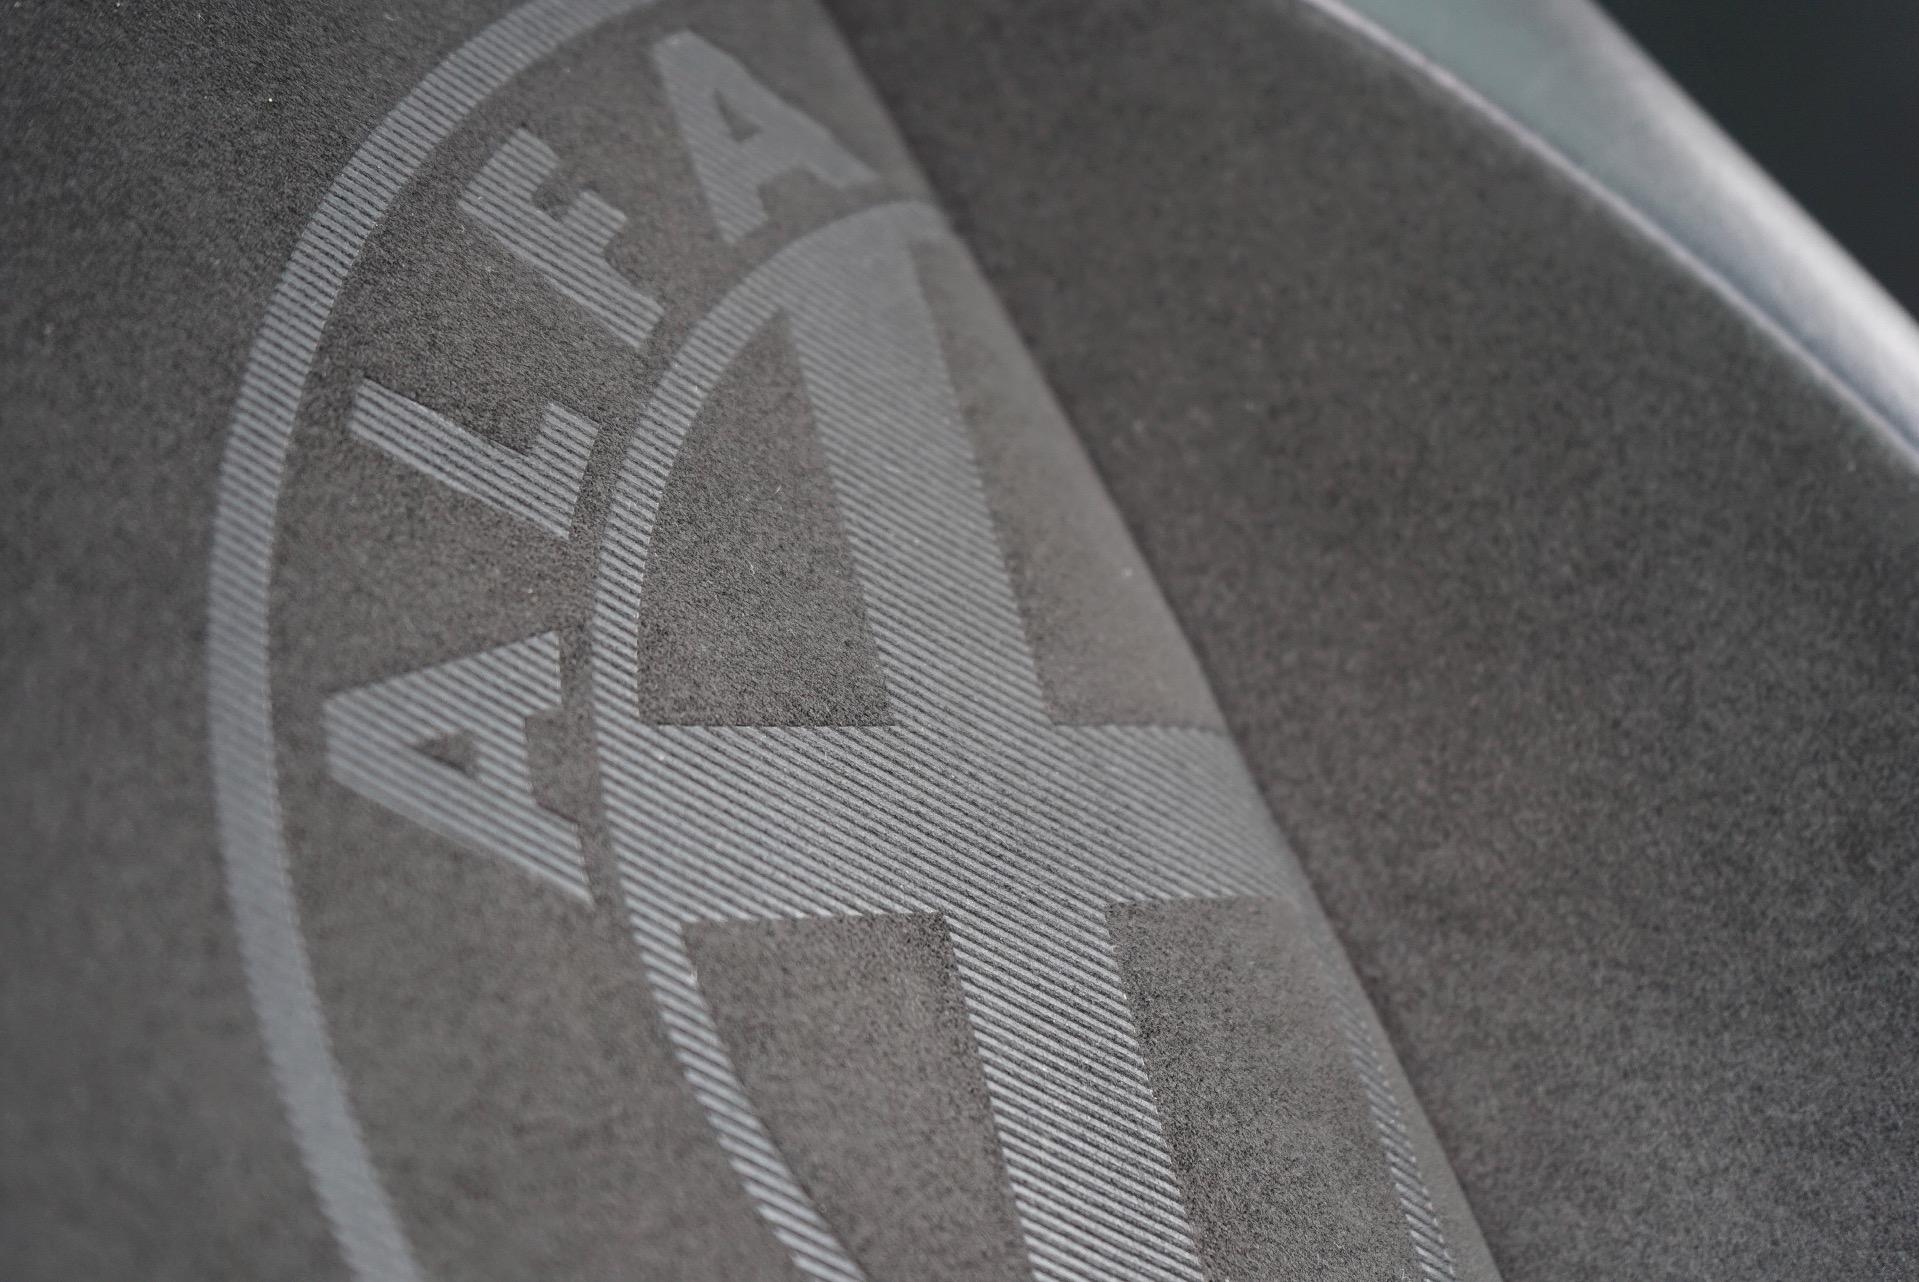 ALFA ROMEO GIULIETTA 1750 TBi QV TCT LAUNCH EDITION